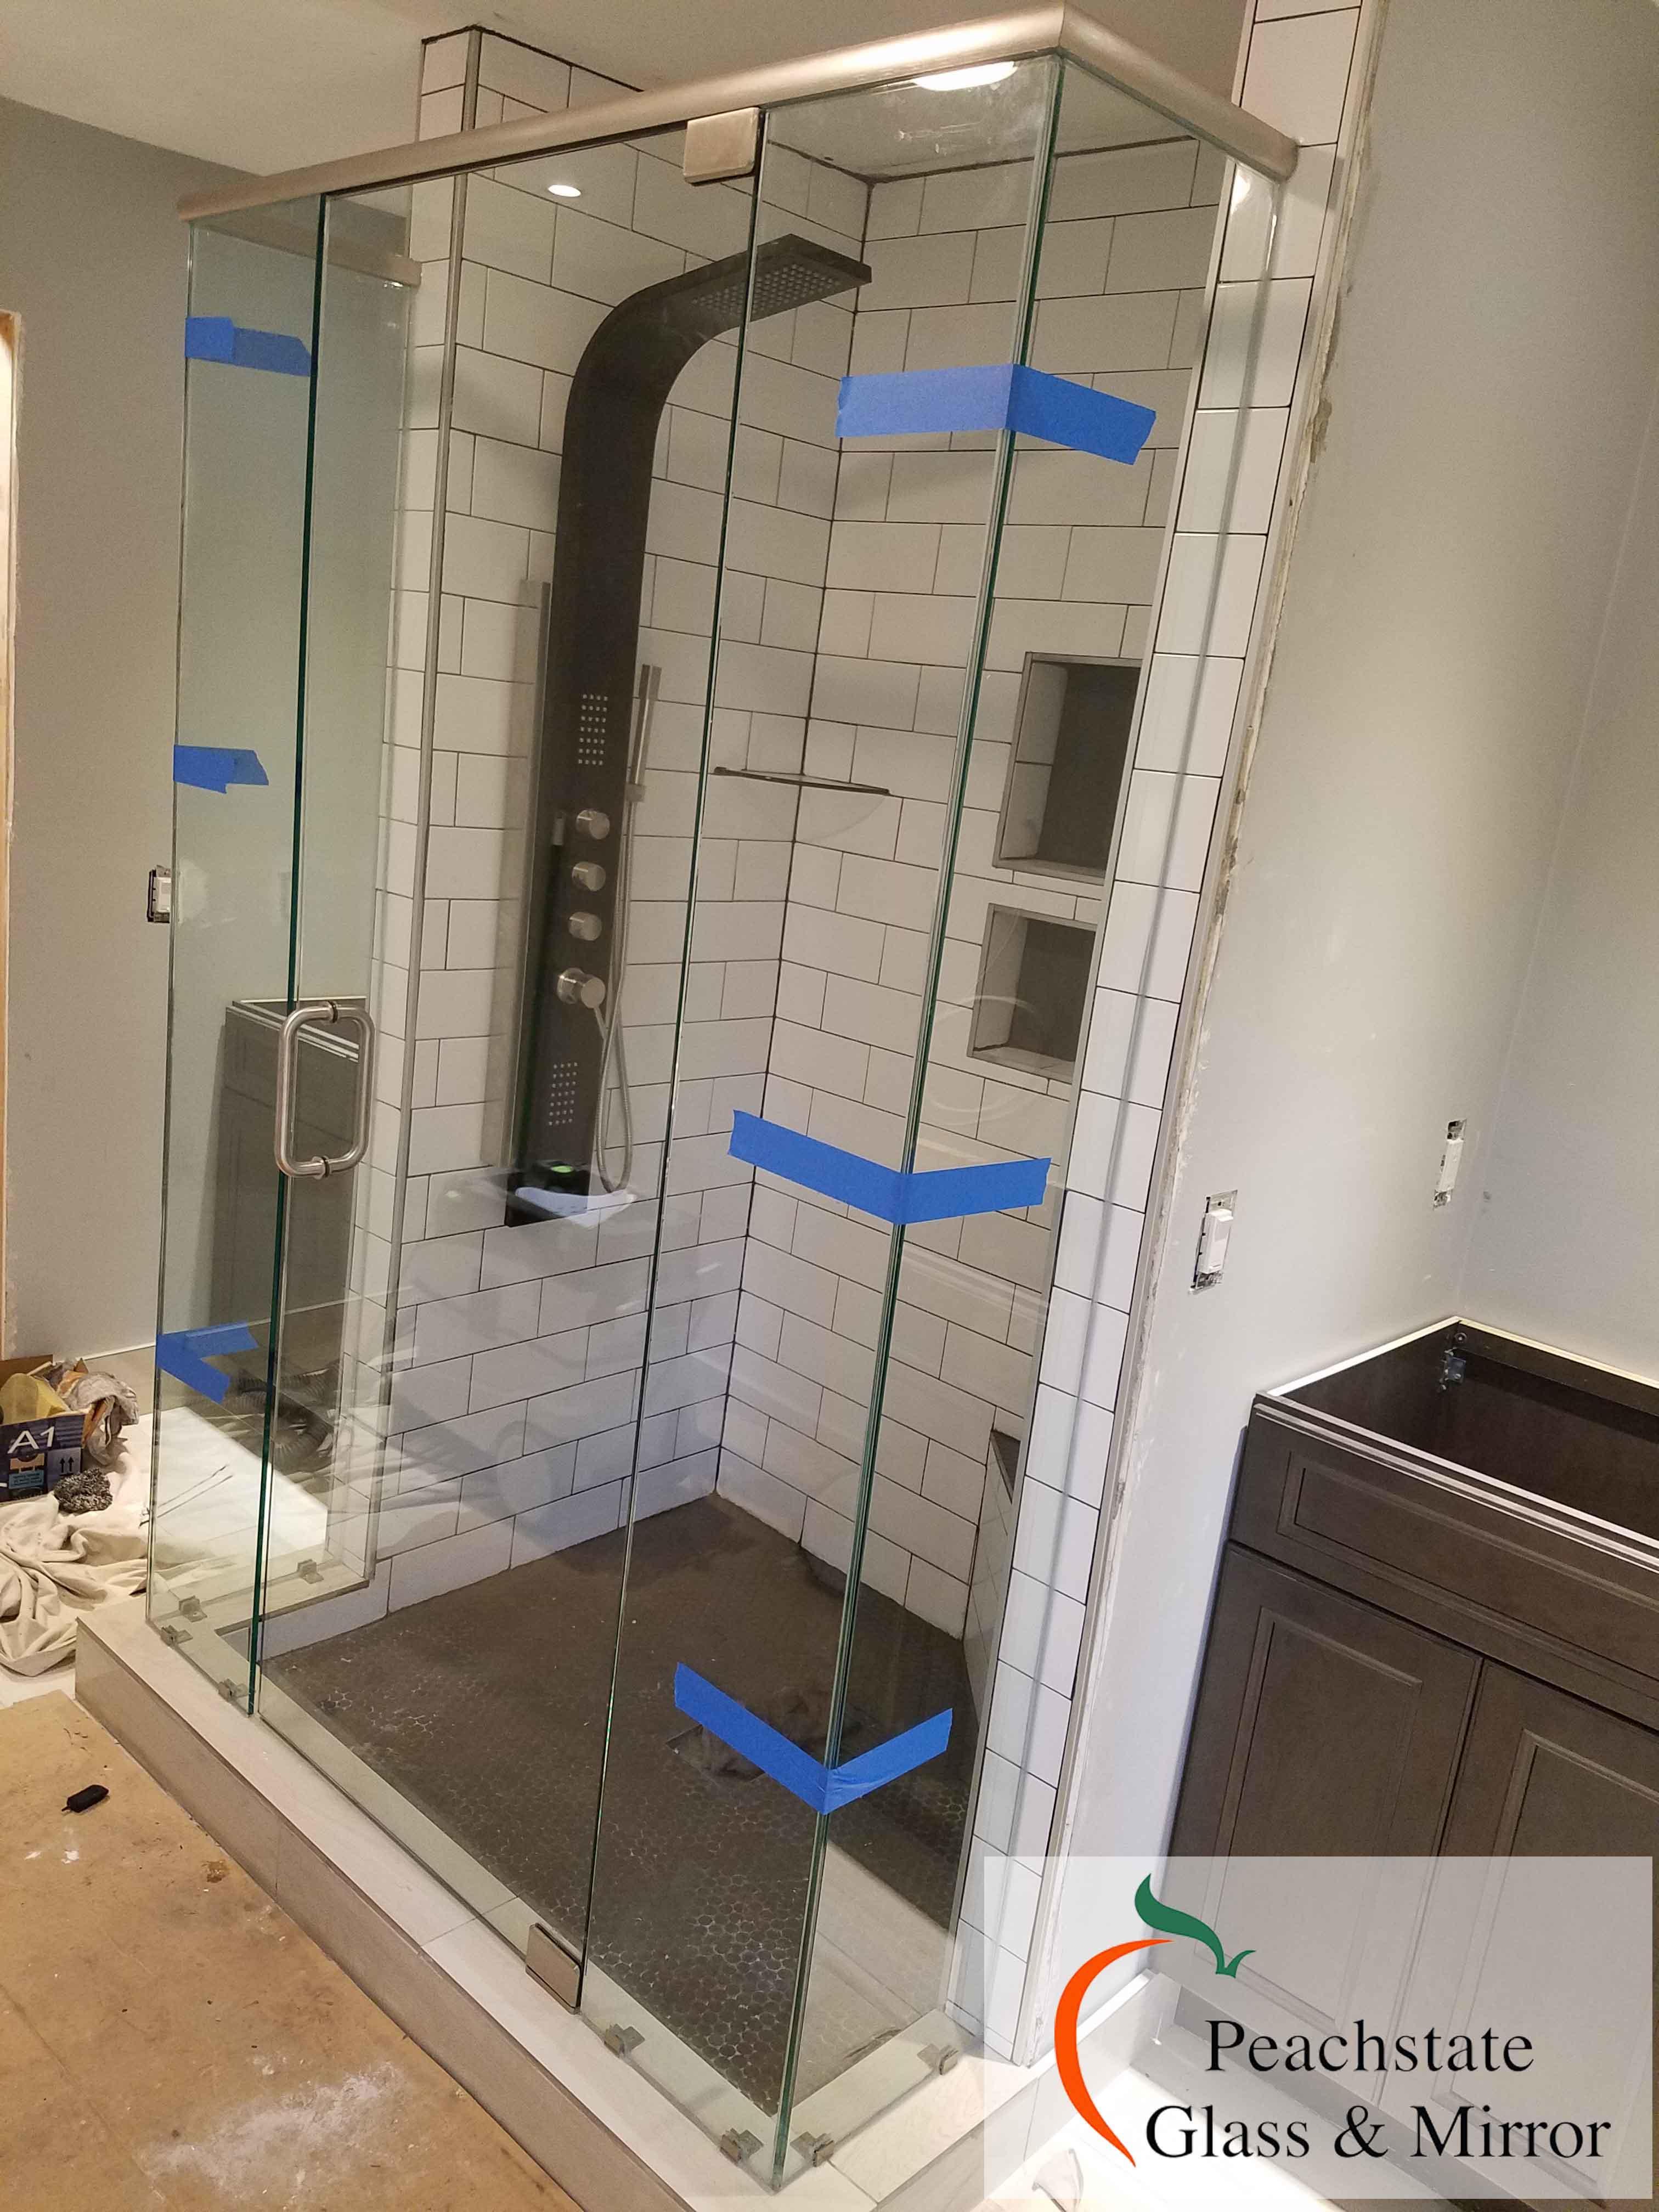 Peachstate Glass & Mirror